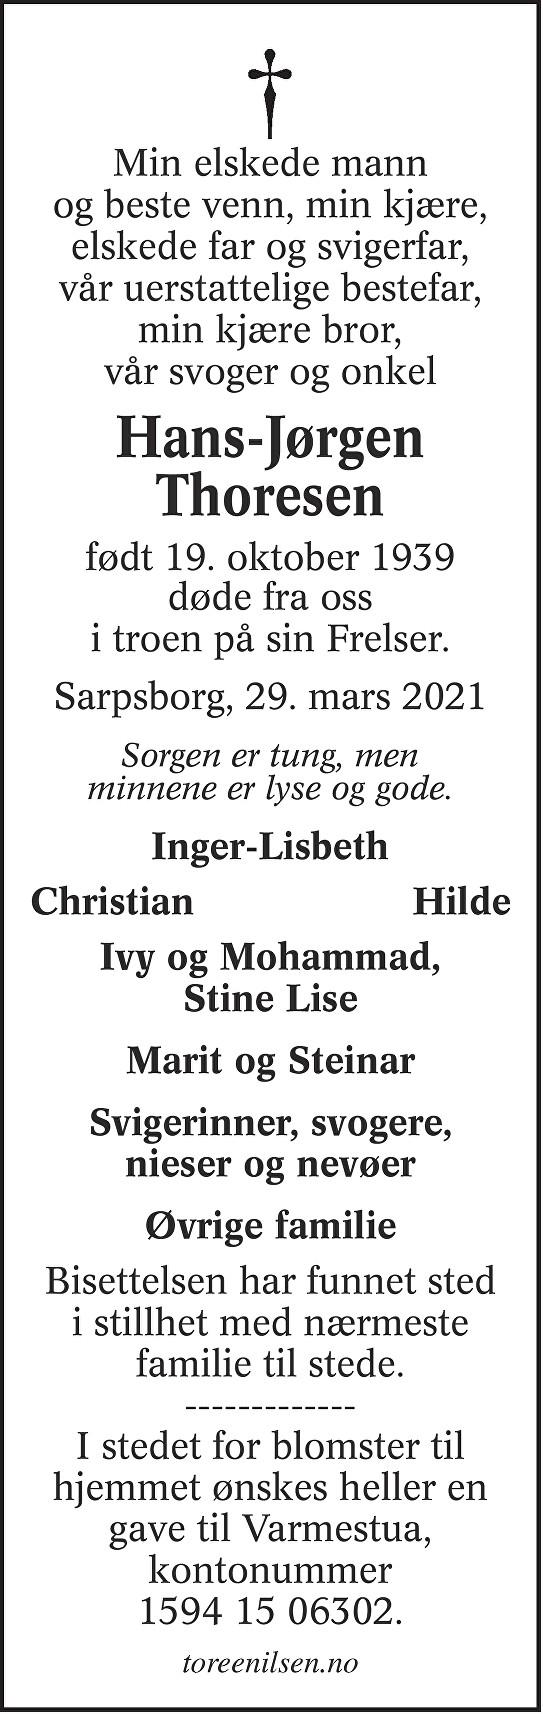 Hans-Jørgen Thoresen Dødsannonse